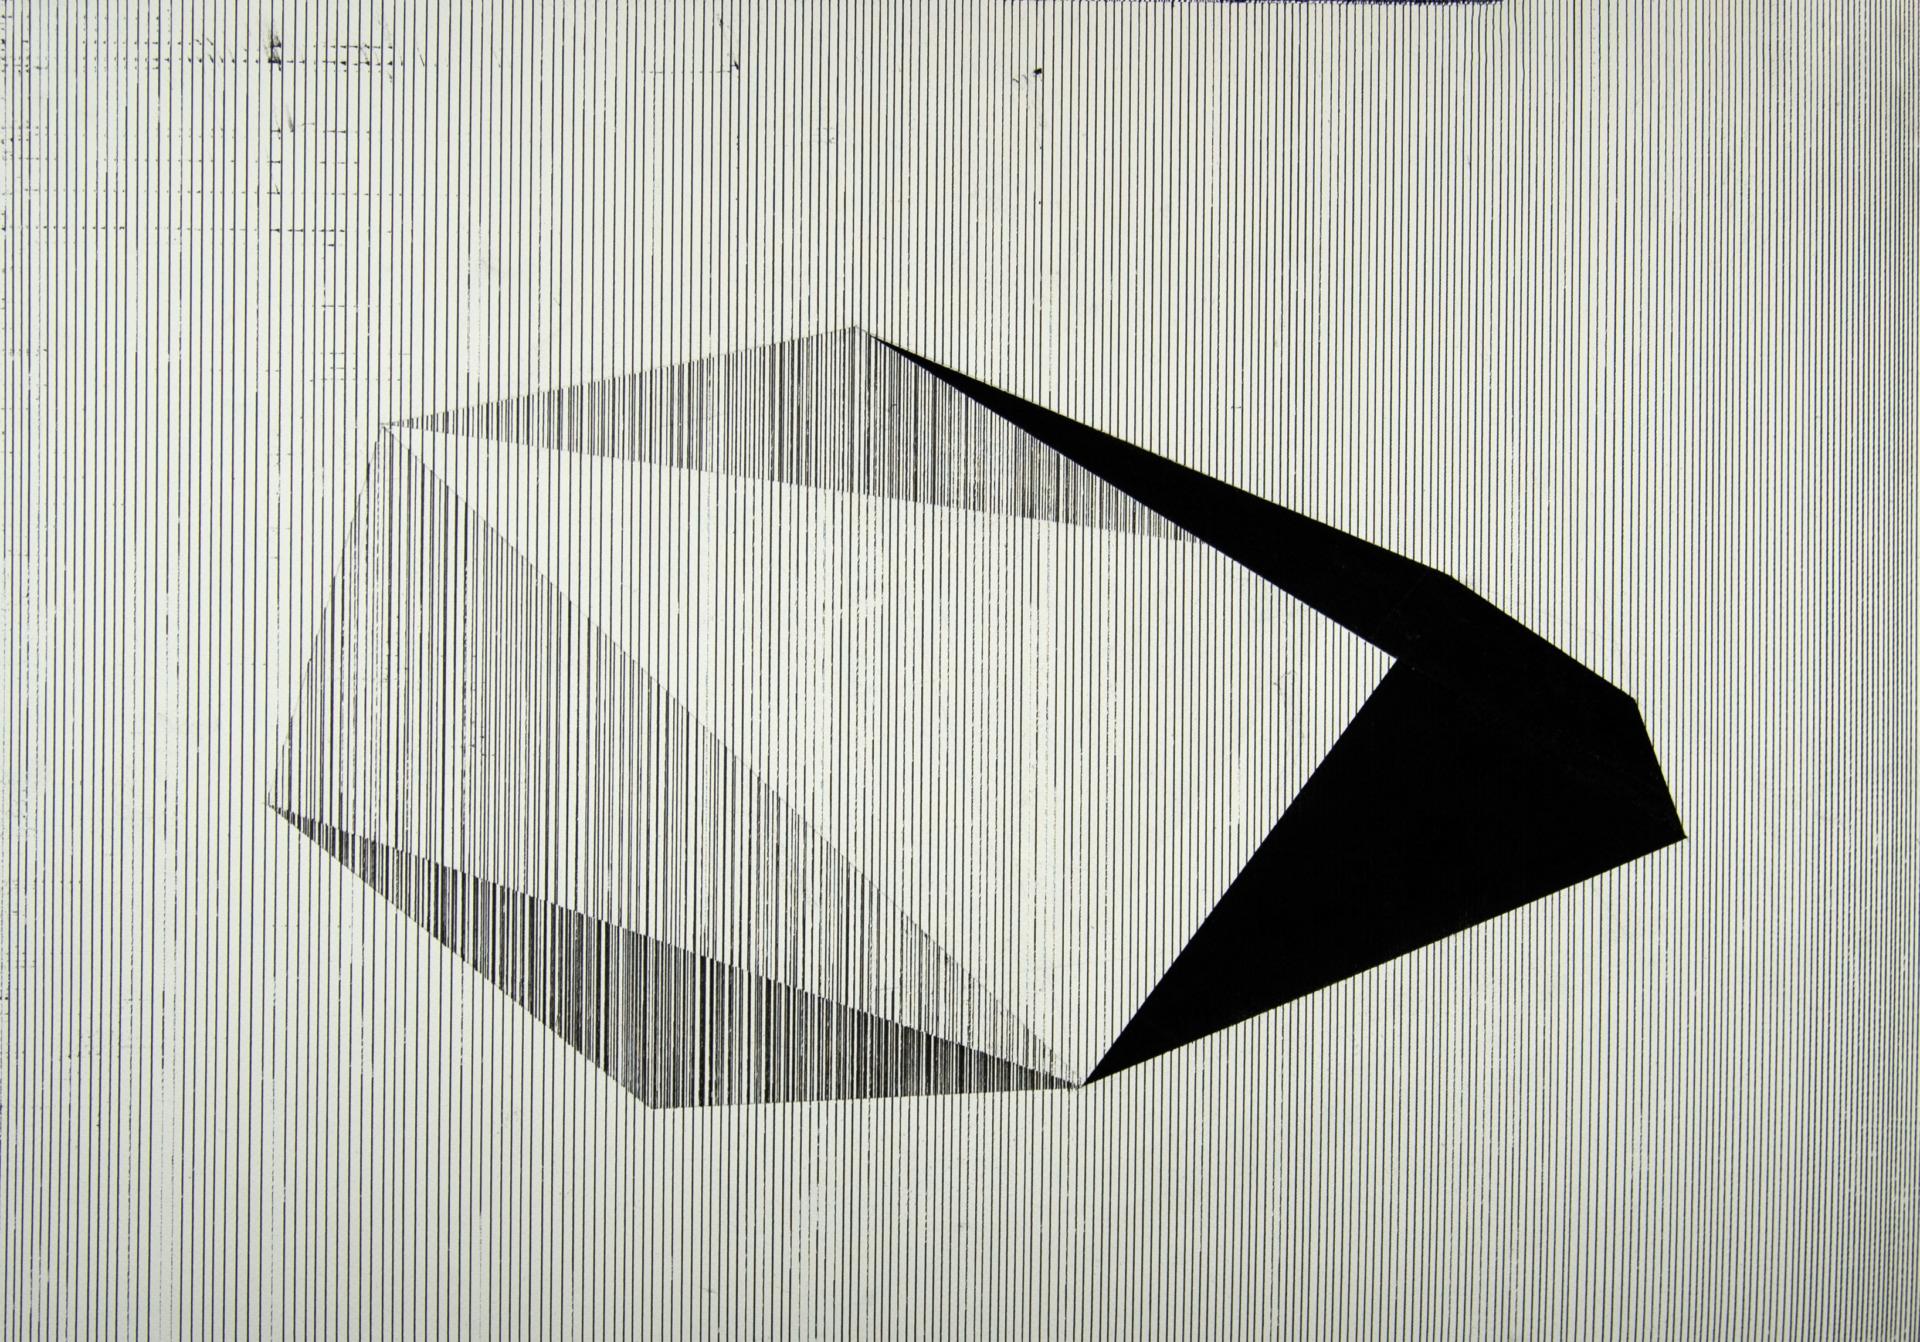 Contemporary art from Gyula Sági | Op.180121. 1